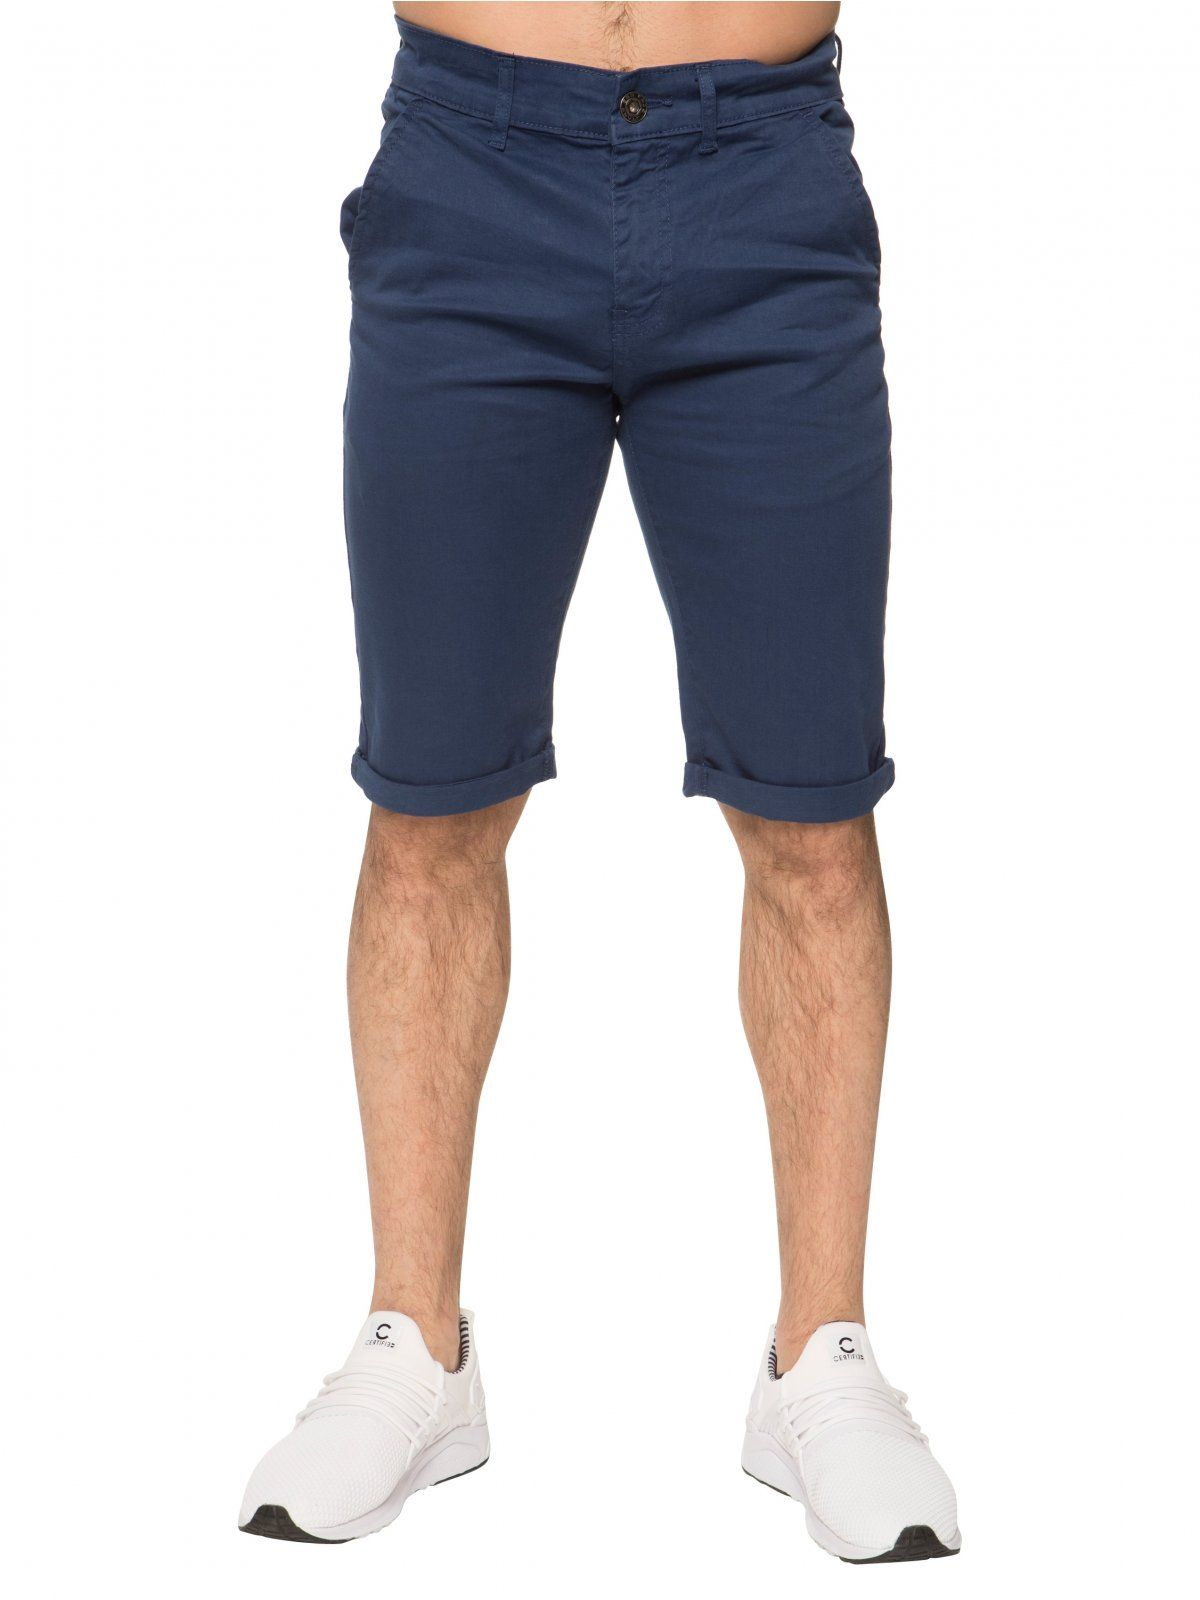 Mens Slim Fit Stretch Chino Shorts | Enzo Designer Menswear